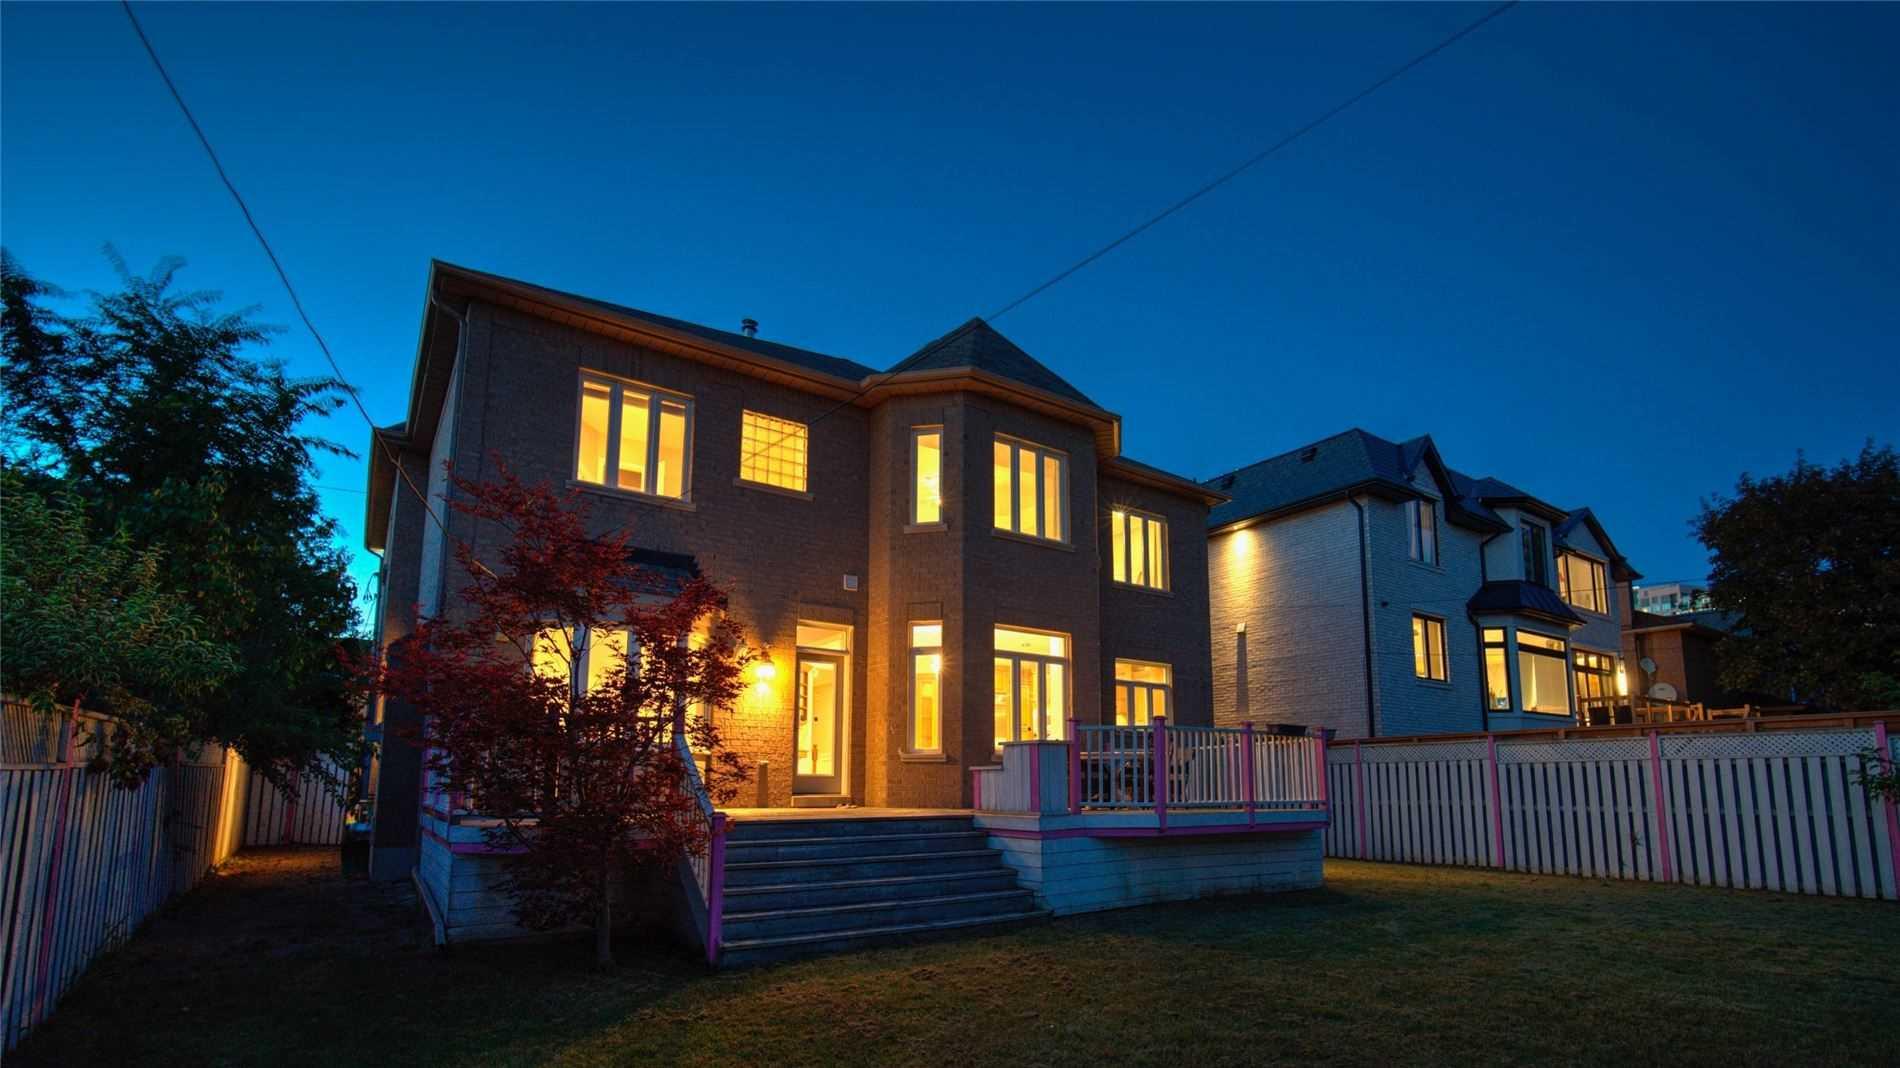 71 Lorraine Dr, Toronto, Ontario M2N2E7, 4 Bedrooms Bedrooms, 13 Rooms Rooms,5 BathroomsBathrooms,Detached,For Sale,Lorraine,C5358413